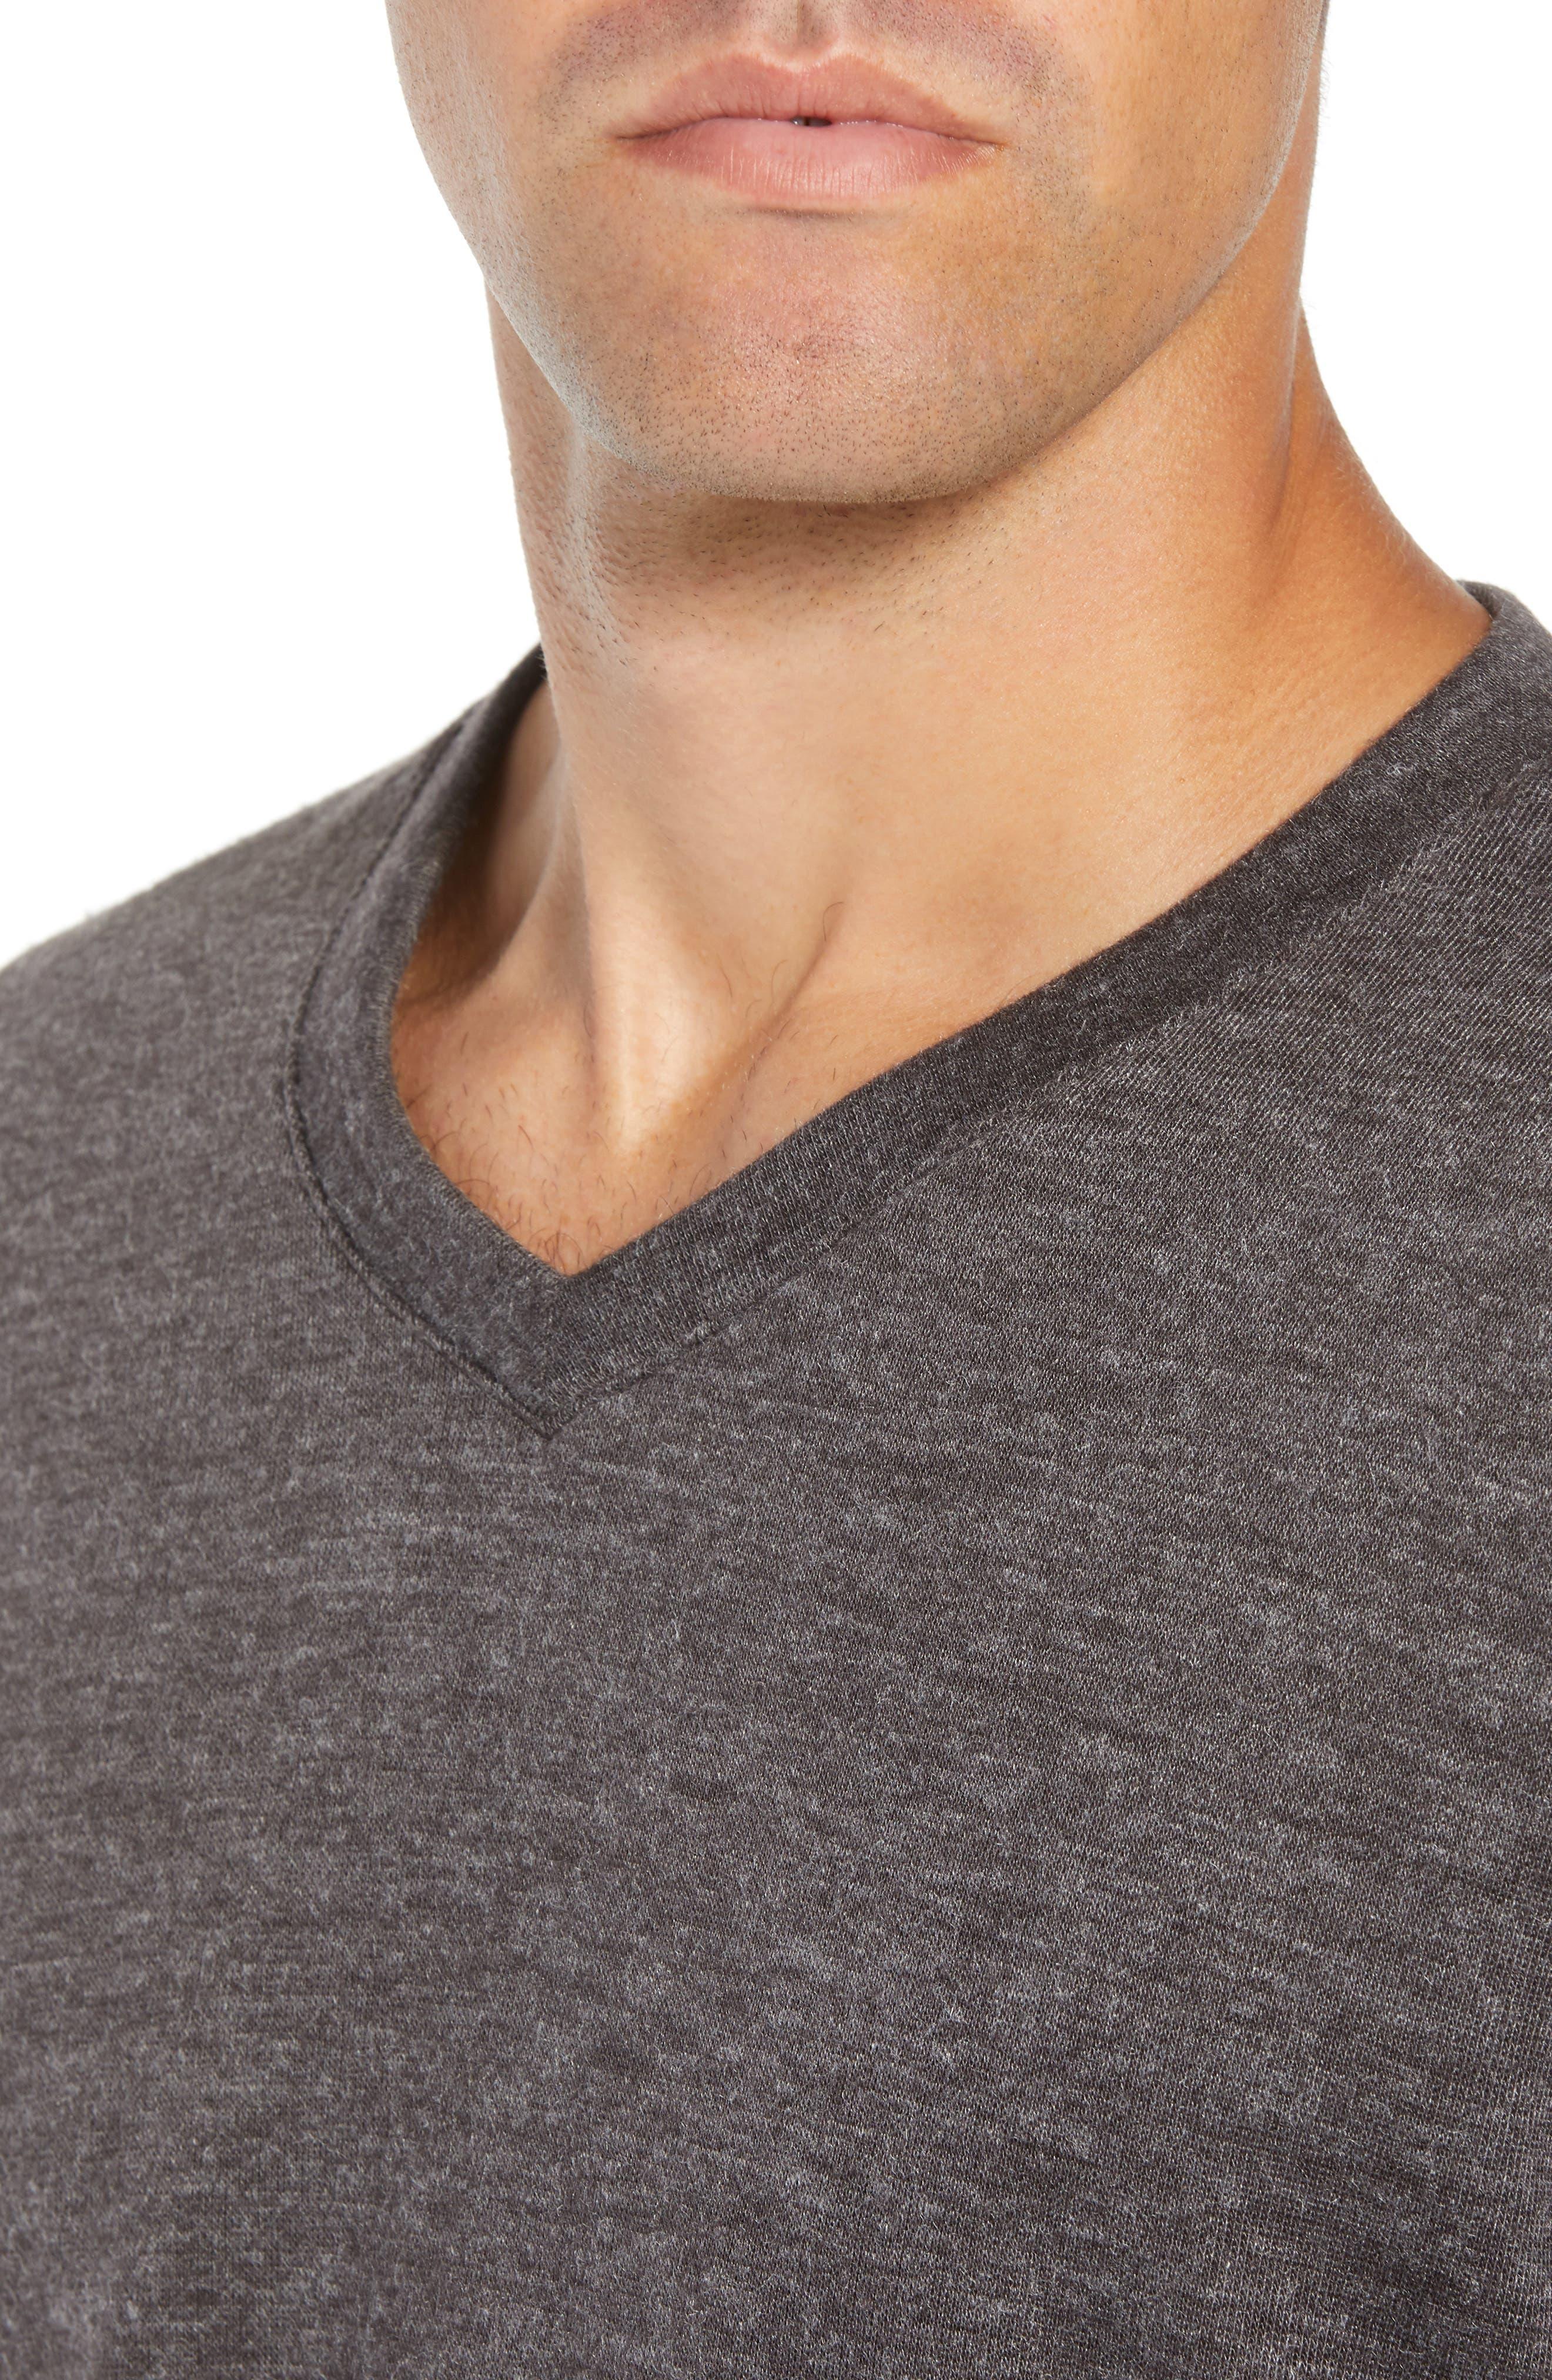 Prospect V-Neck Performance Sweater,                             Alternate thumbnail 4, color,                             CHARCOAL